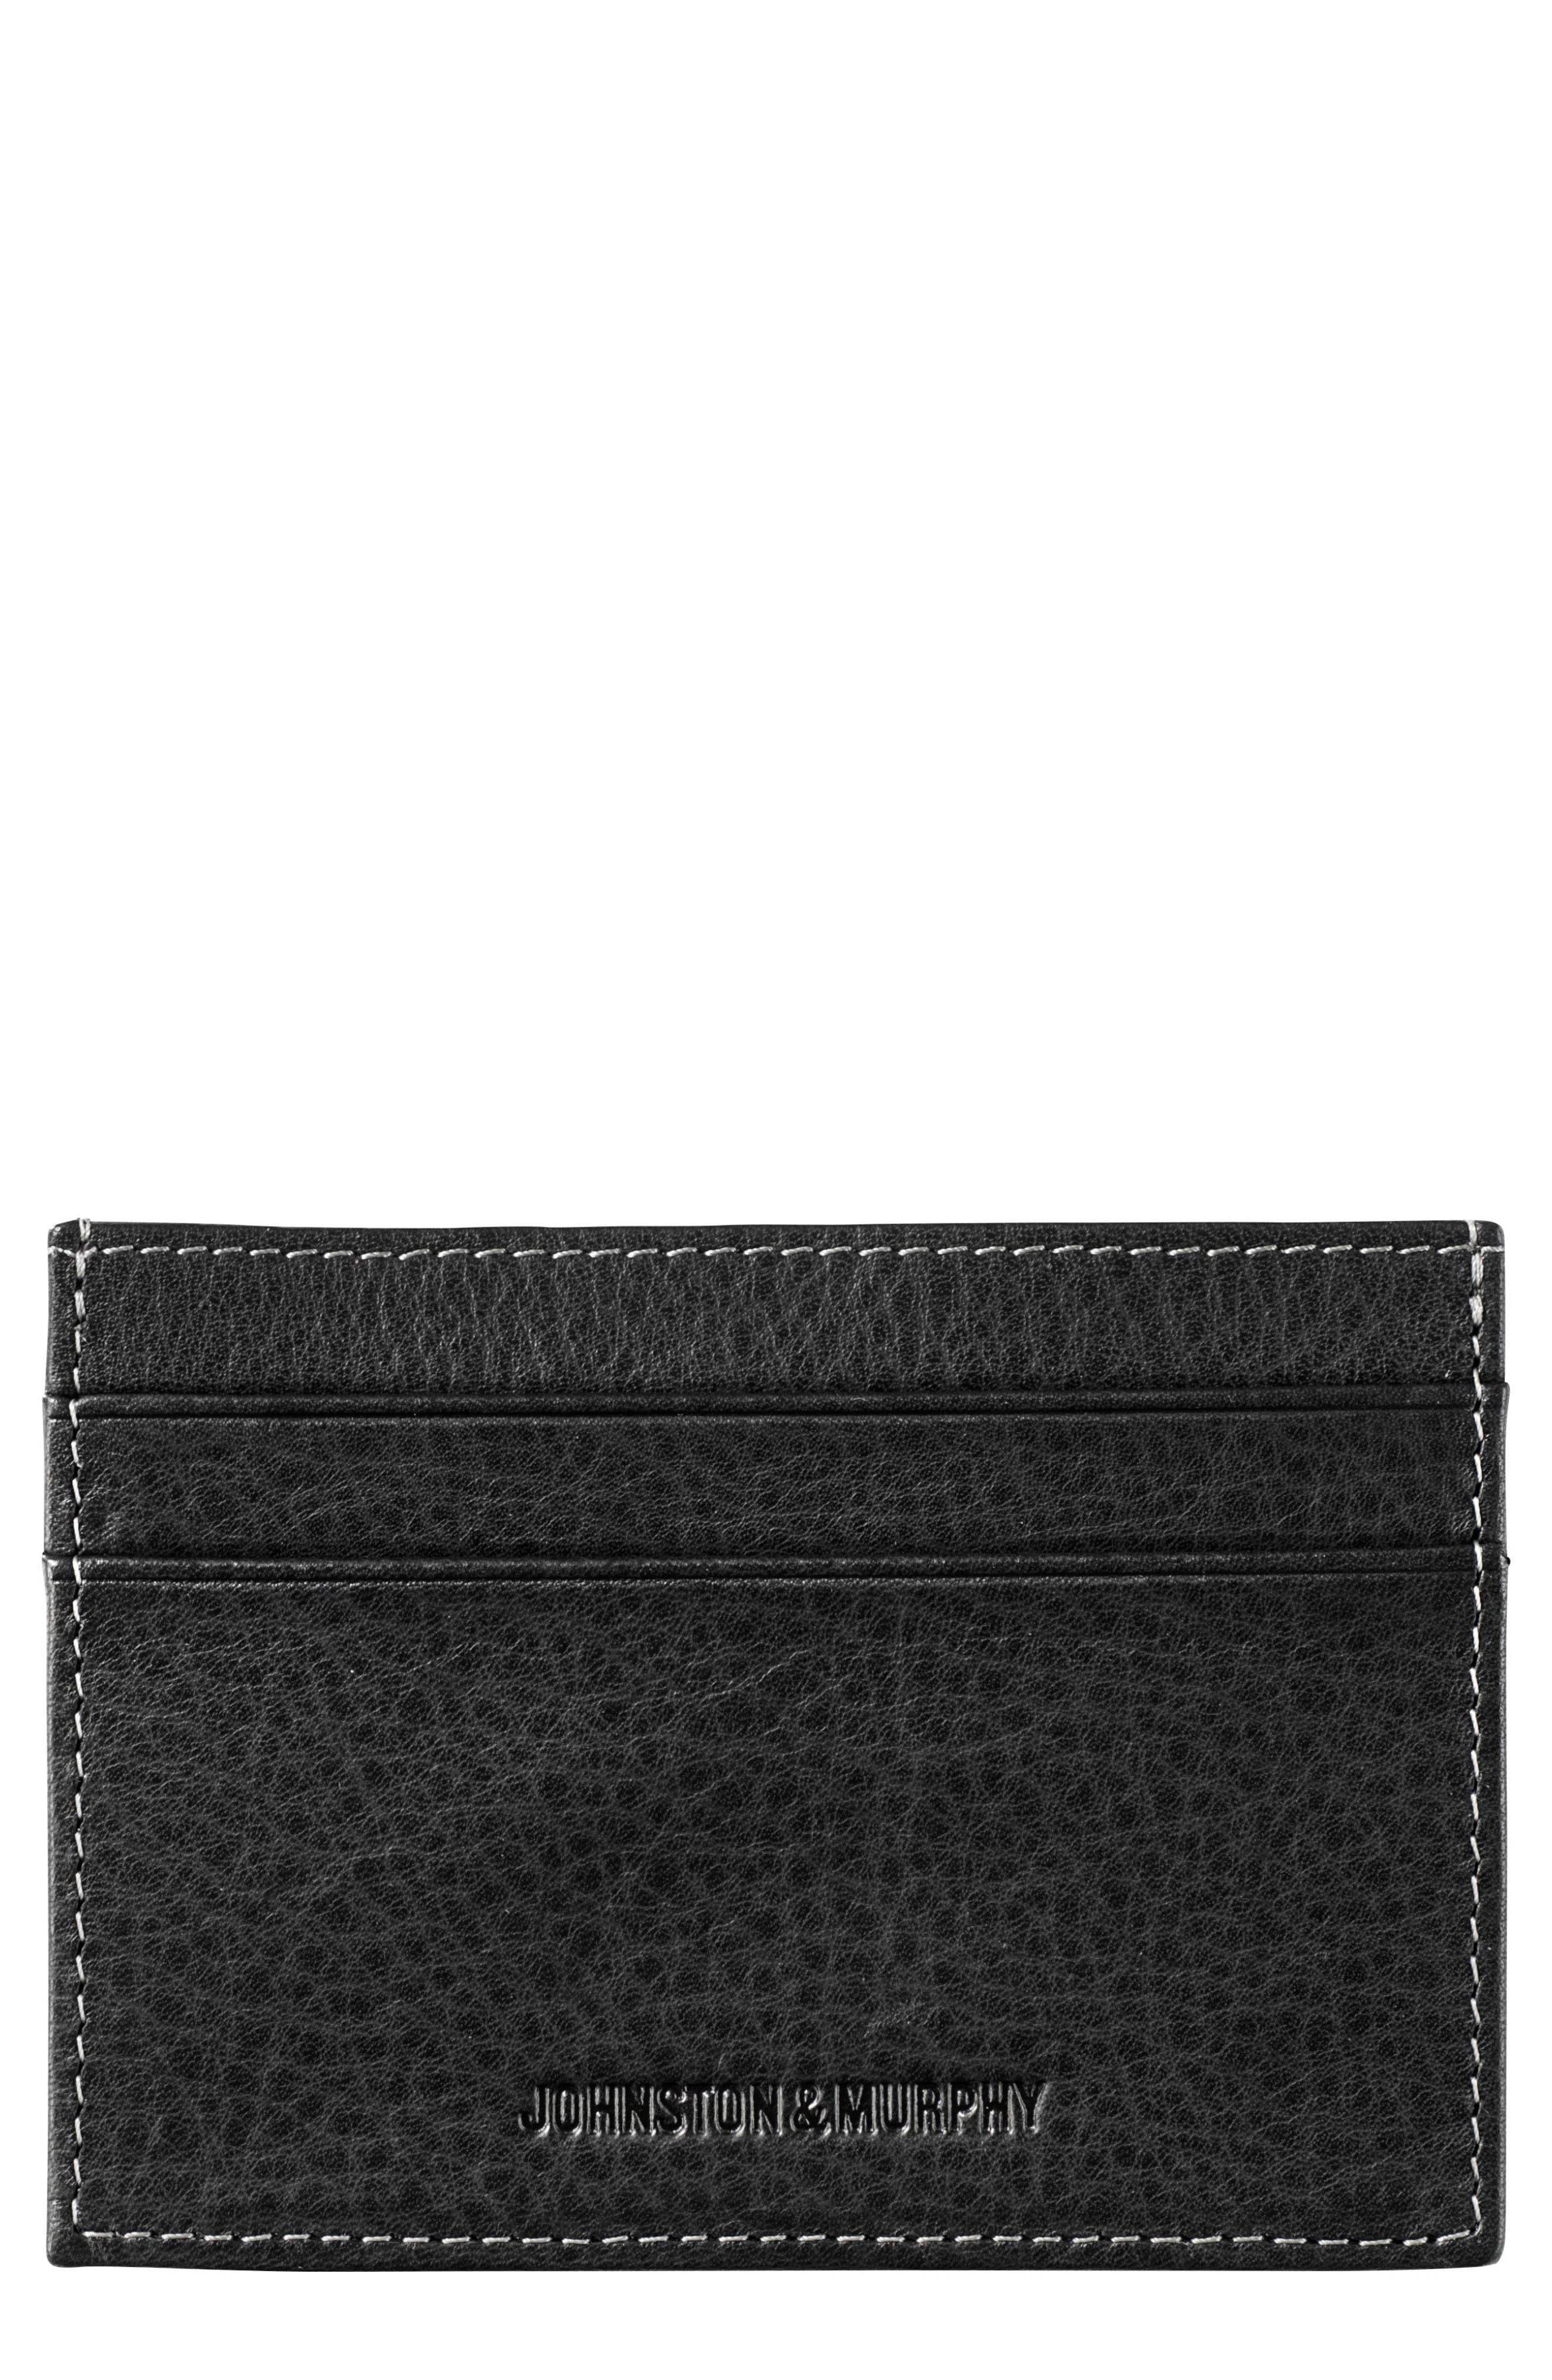 Main Image - Johnston & Murphy Leather Card Case